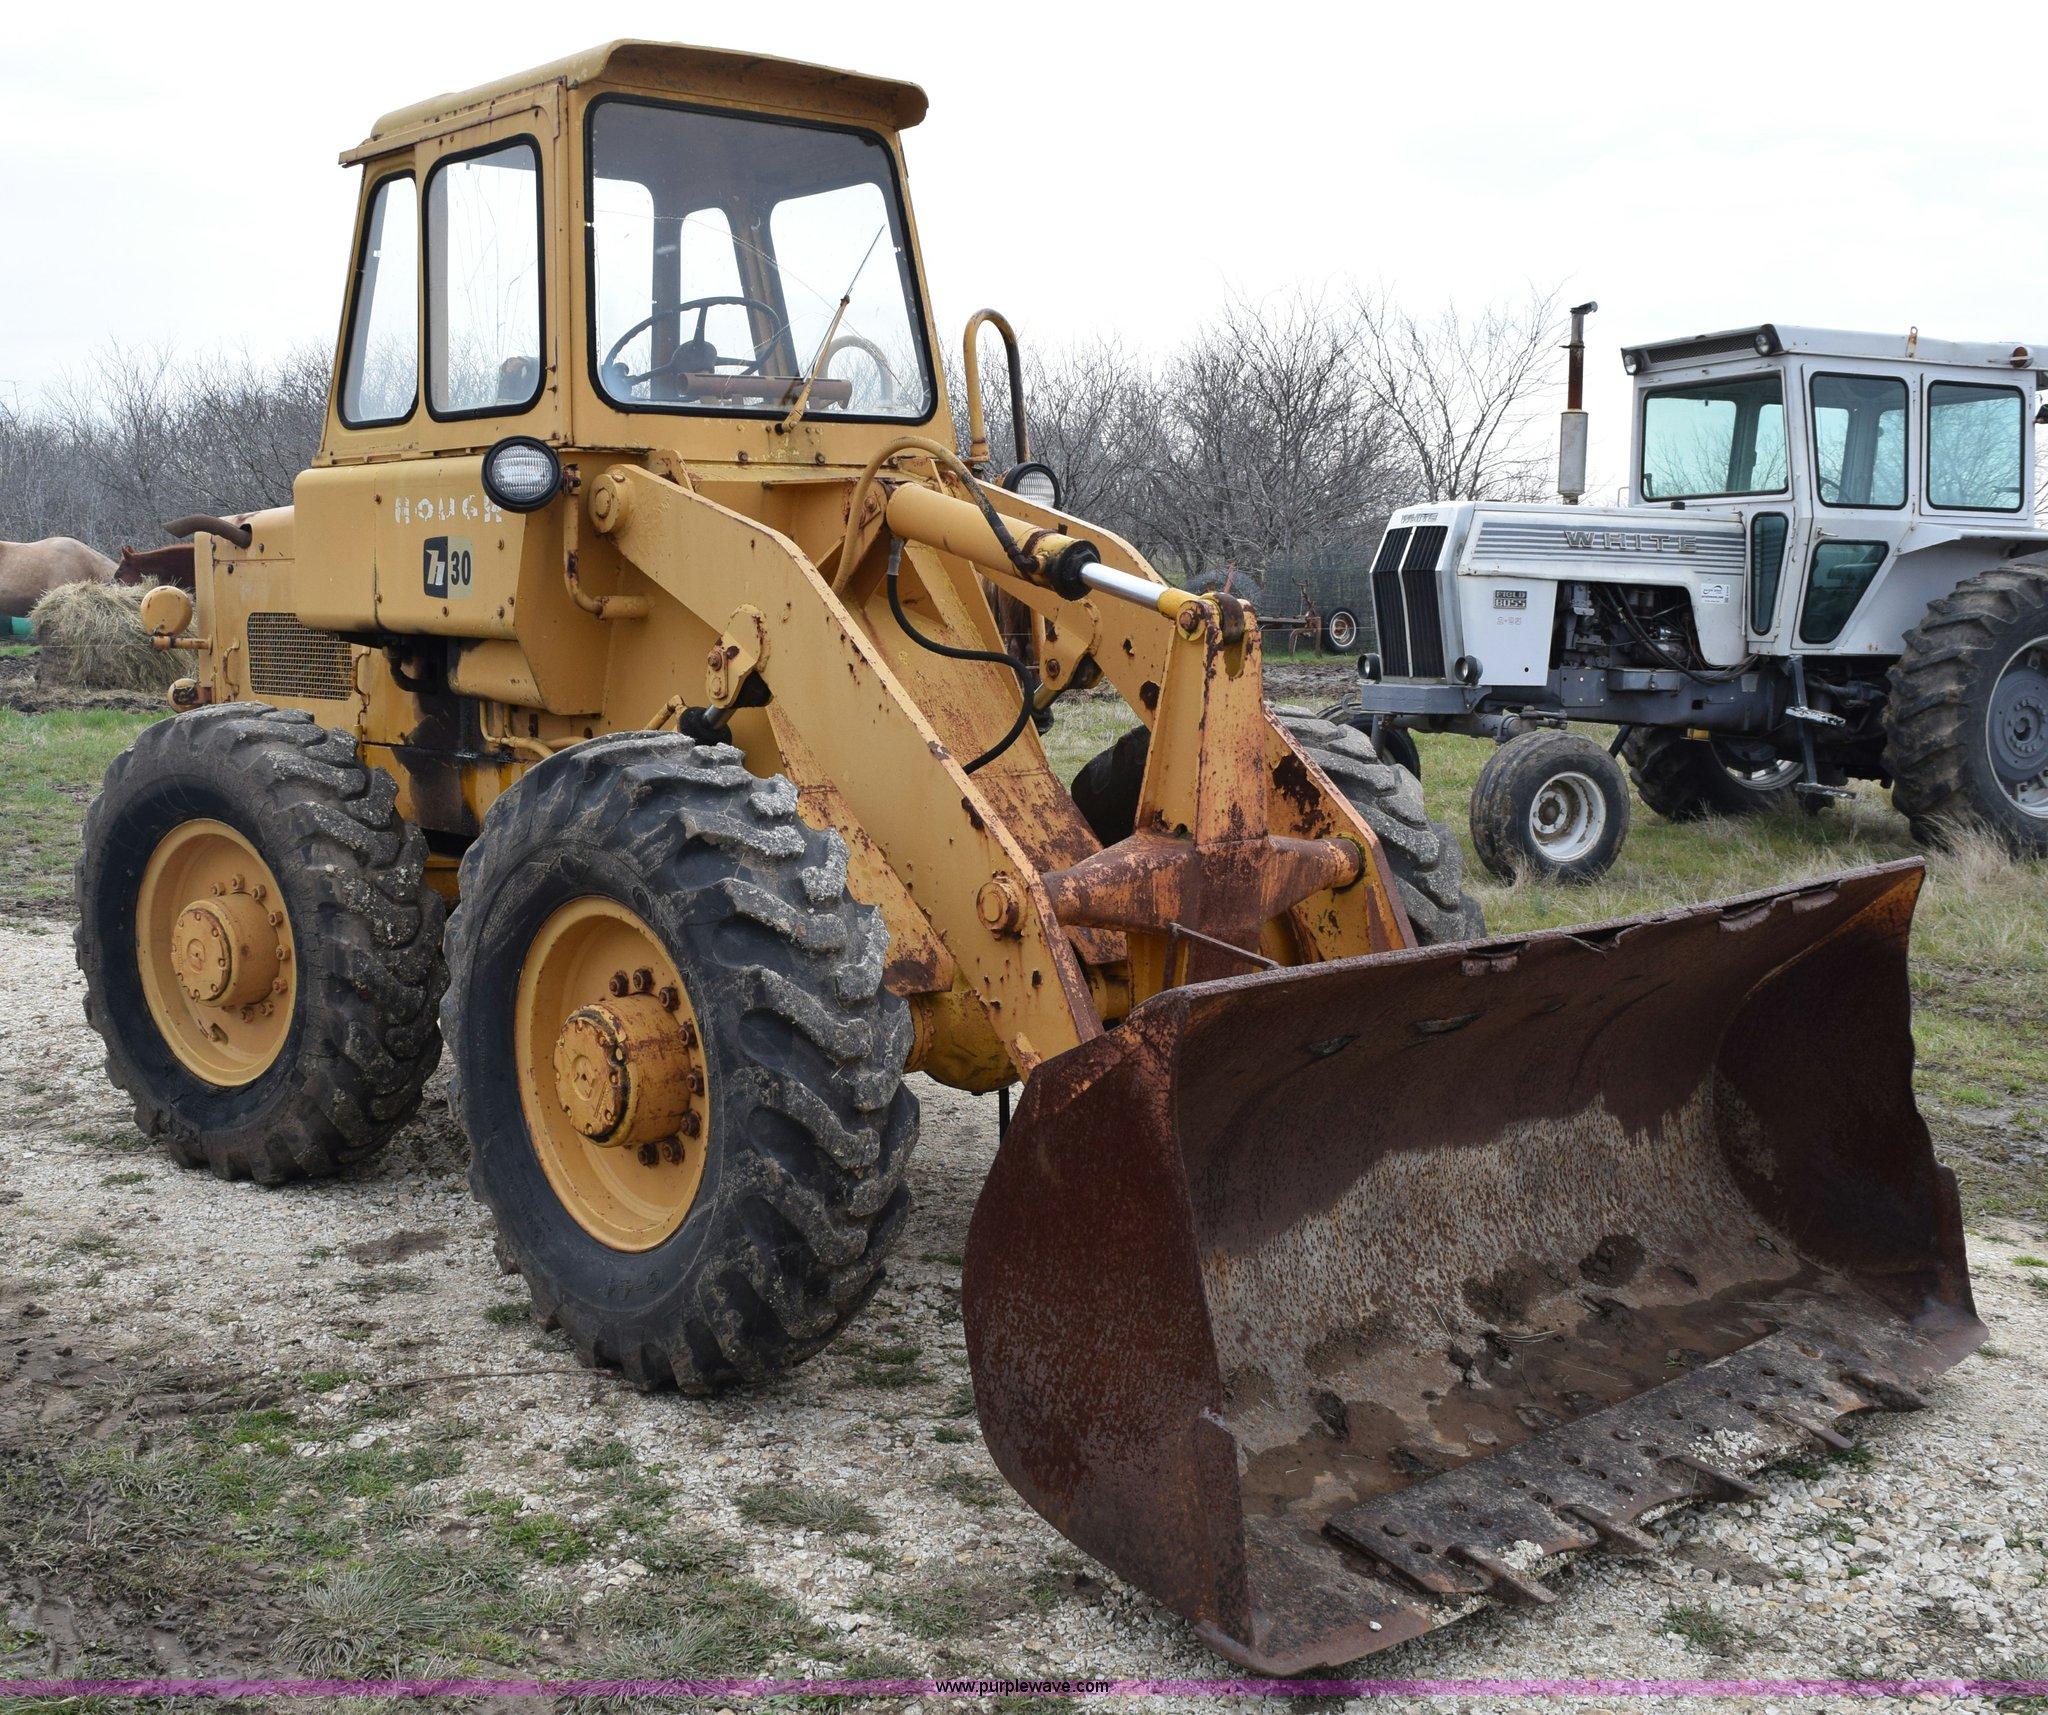 Hough H30 wheel loader | Item E6248 | SOLD! March 26 Constru